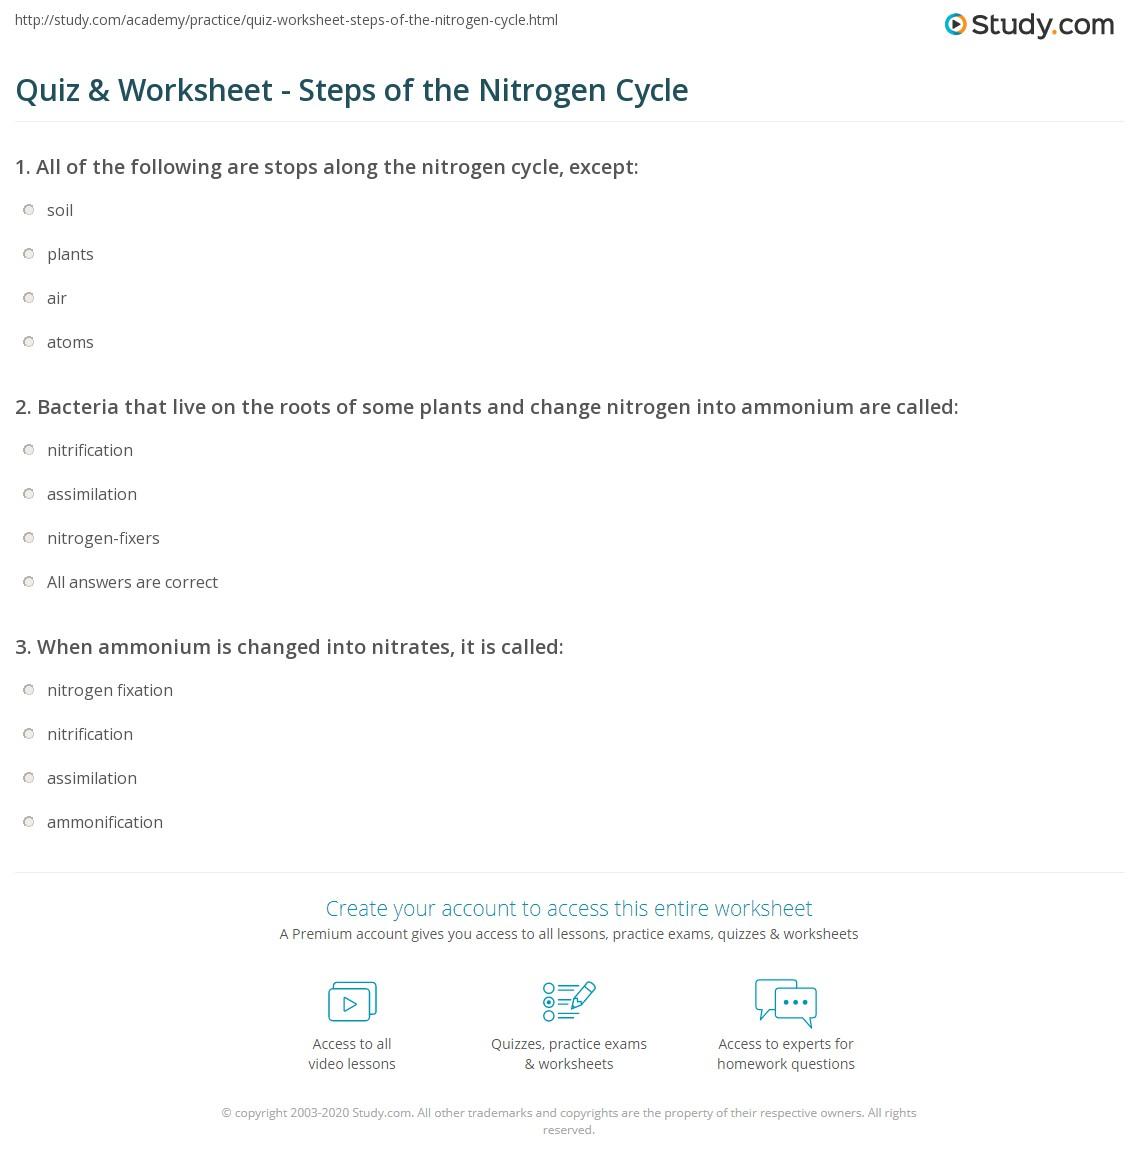 Quiz & Worksheet - Steps of the Nitrogen Cycle | Study.com